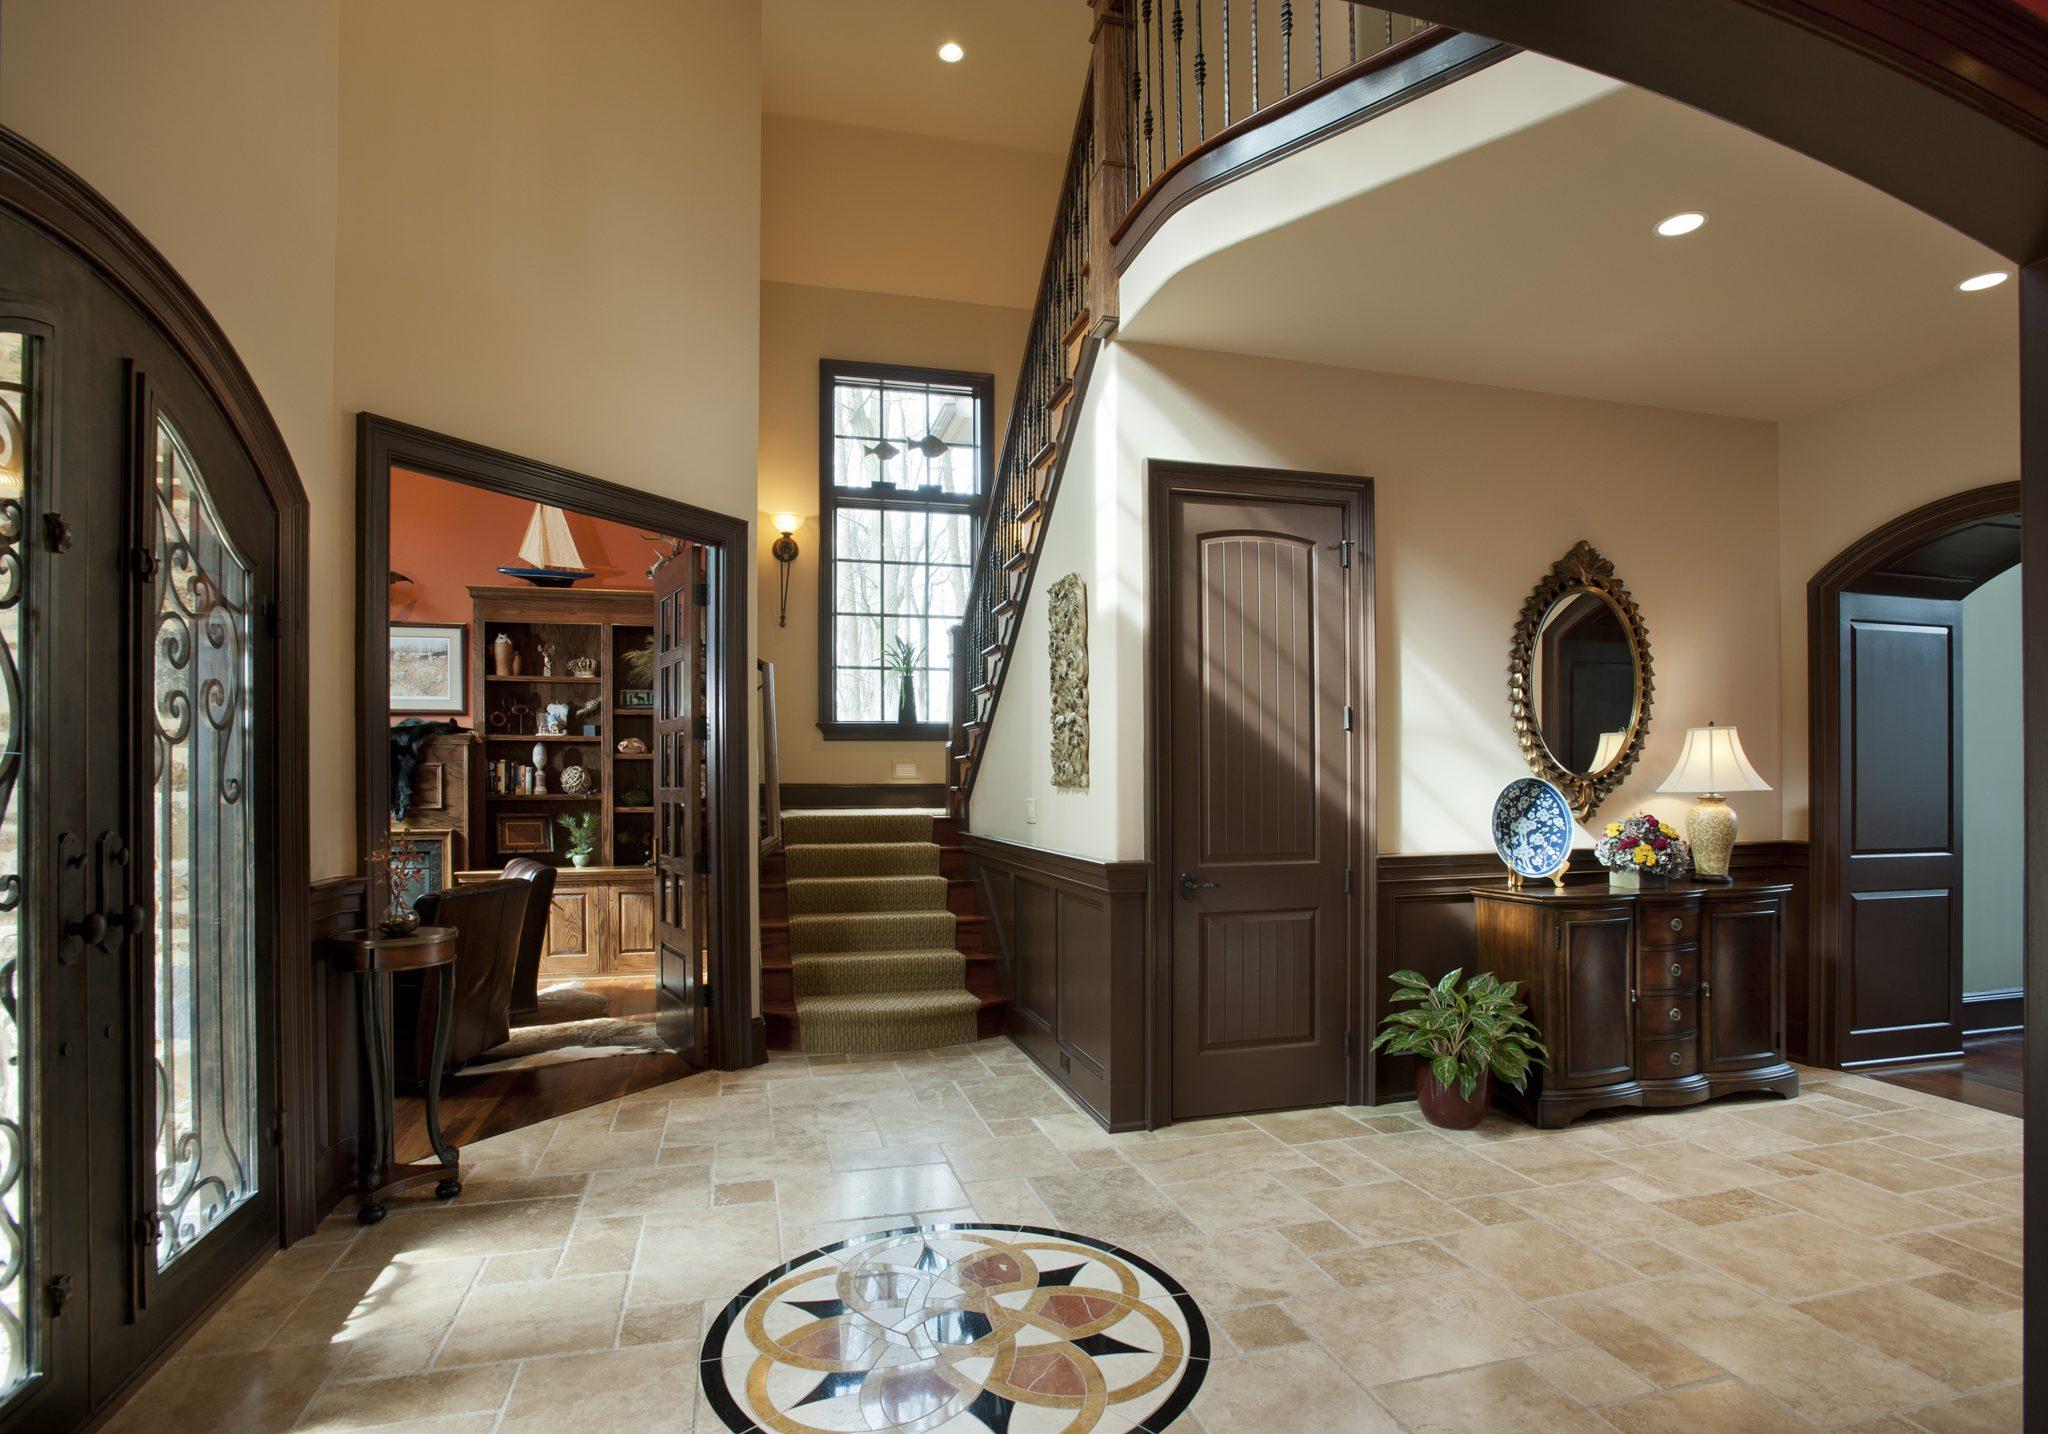 Interior design byWPL Interior Design